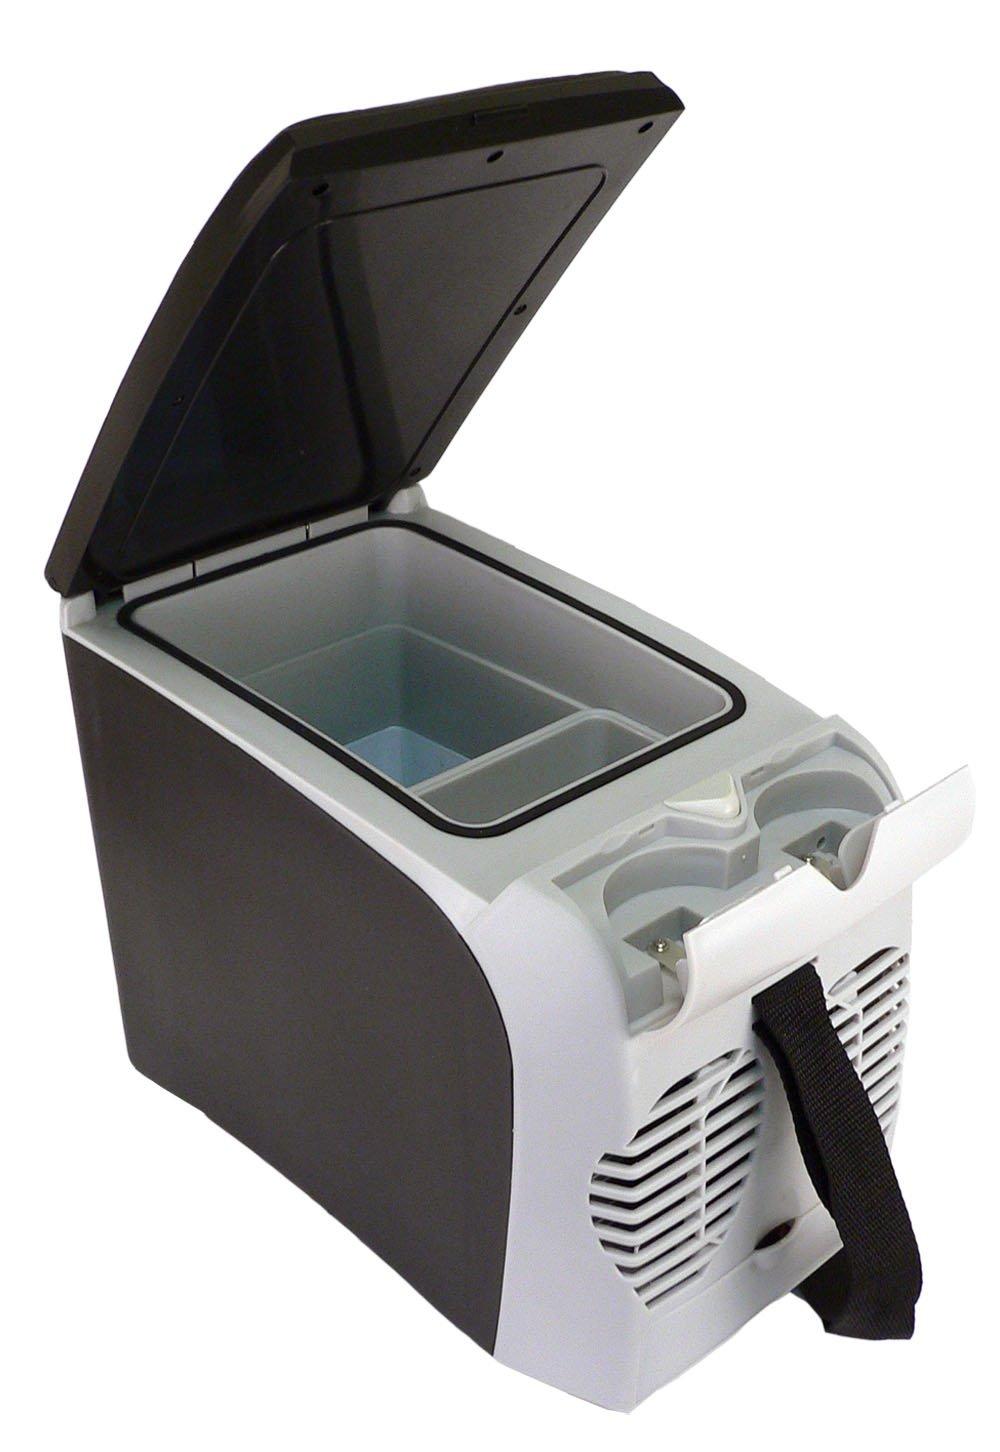 Plug In Cooler : Auto cooler personal plug in fridge warmer heat cool